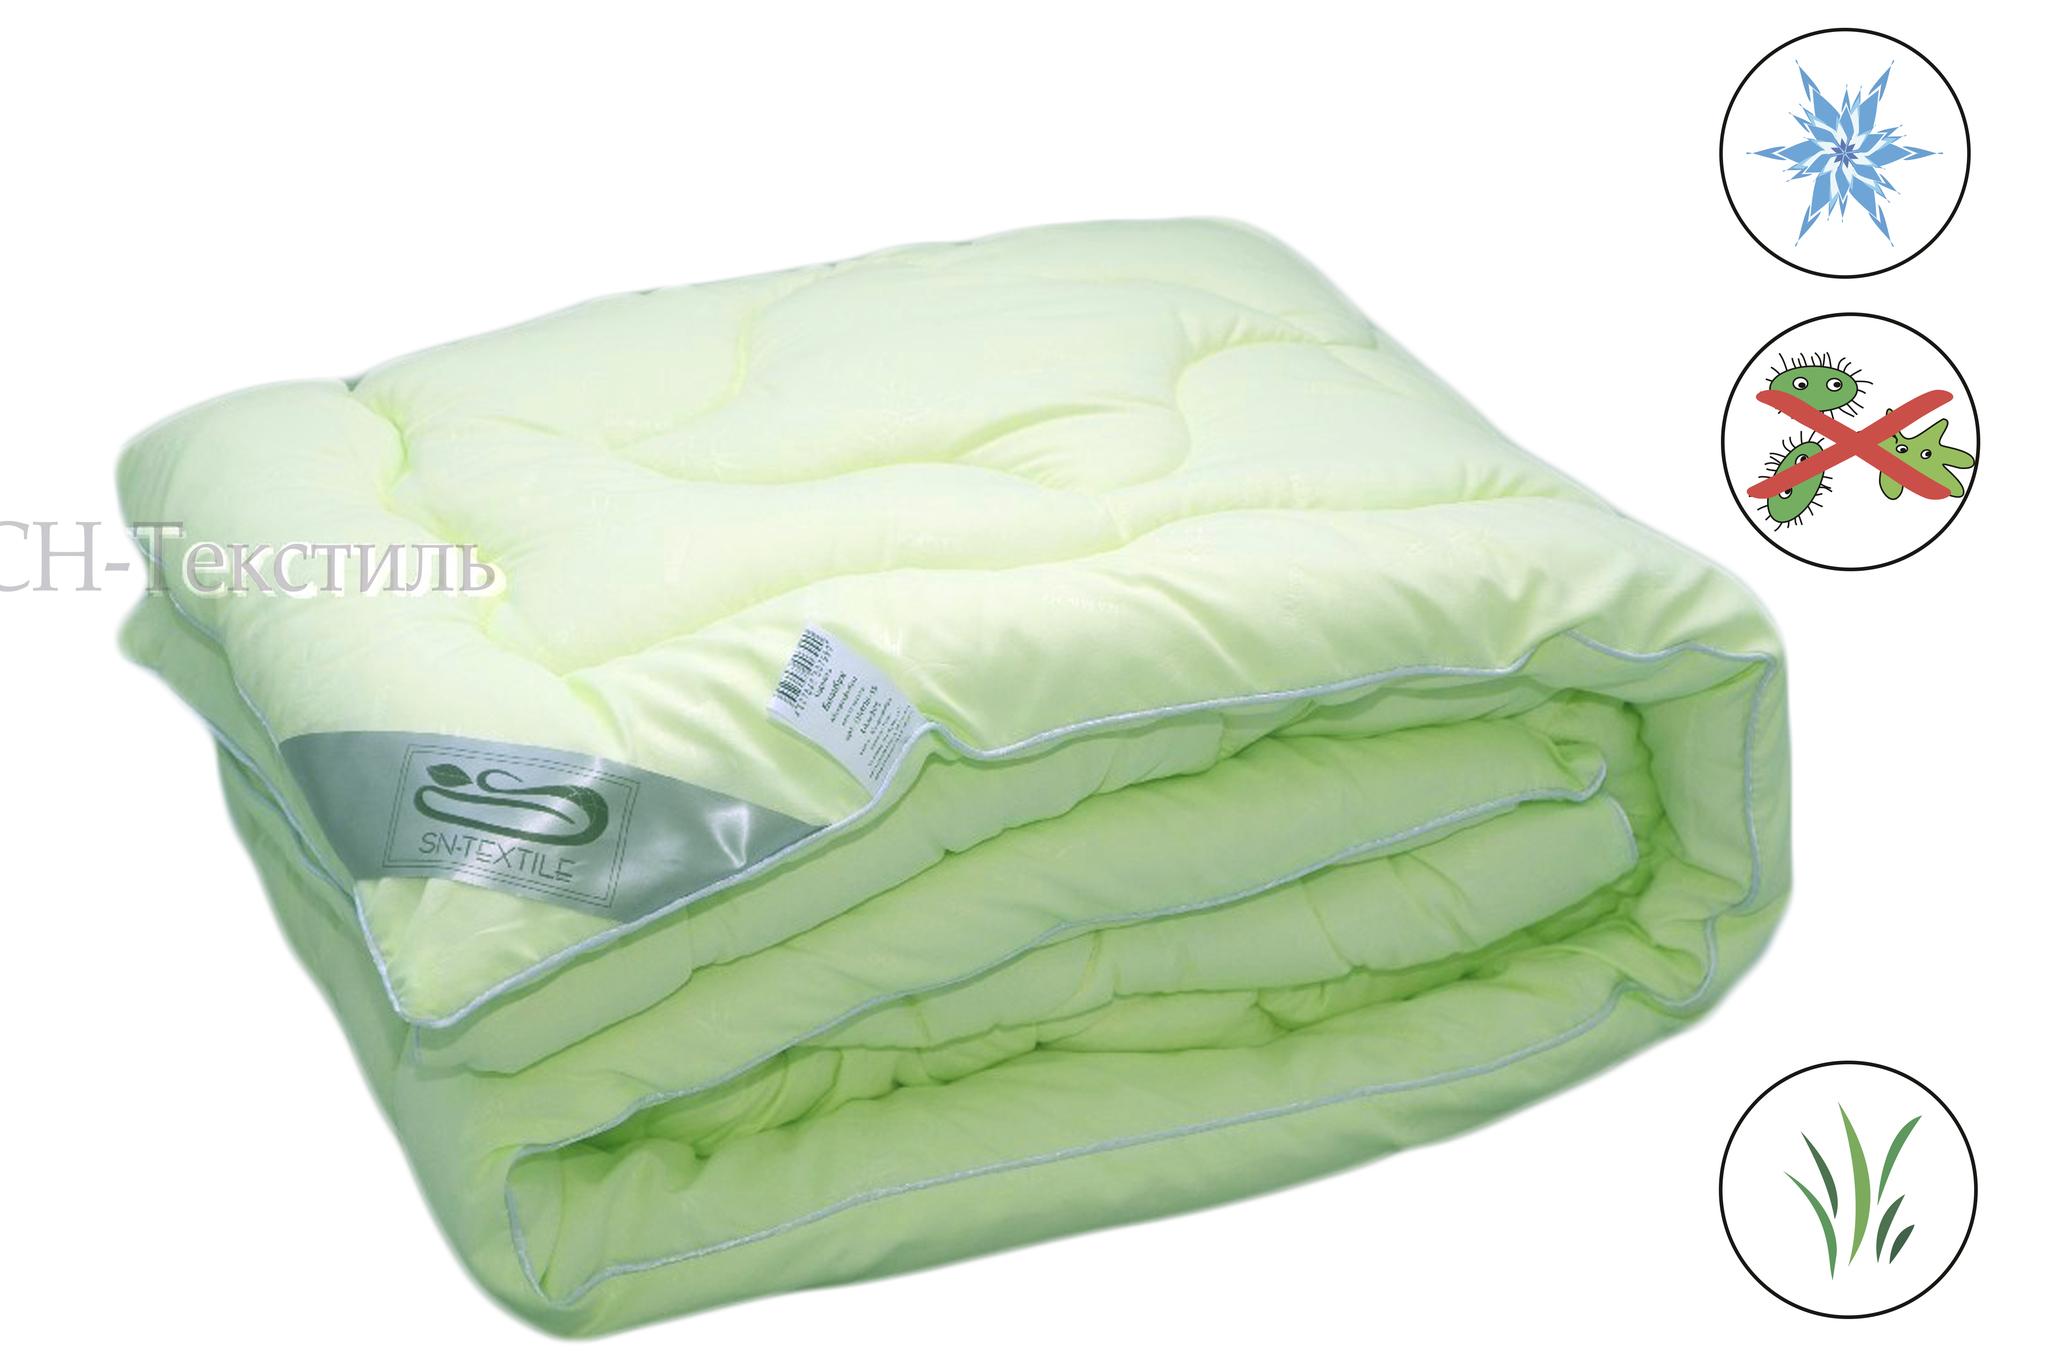 Одеяла Одеяло Коллекции Бамбук-микрофибра Теплое. одеяло_микрофибра_бамбук_зимнее.jpg